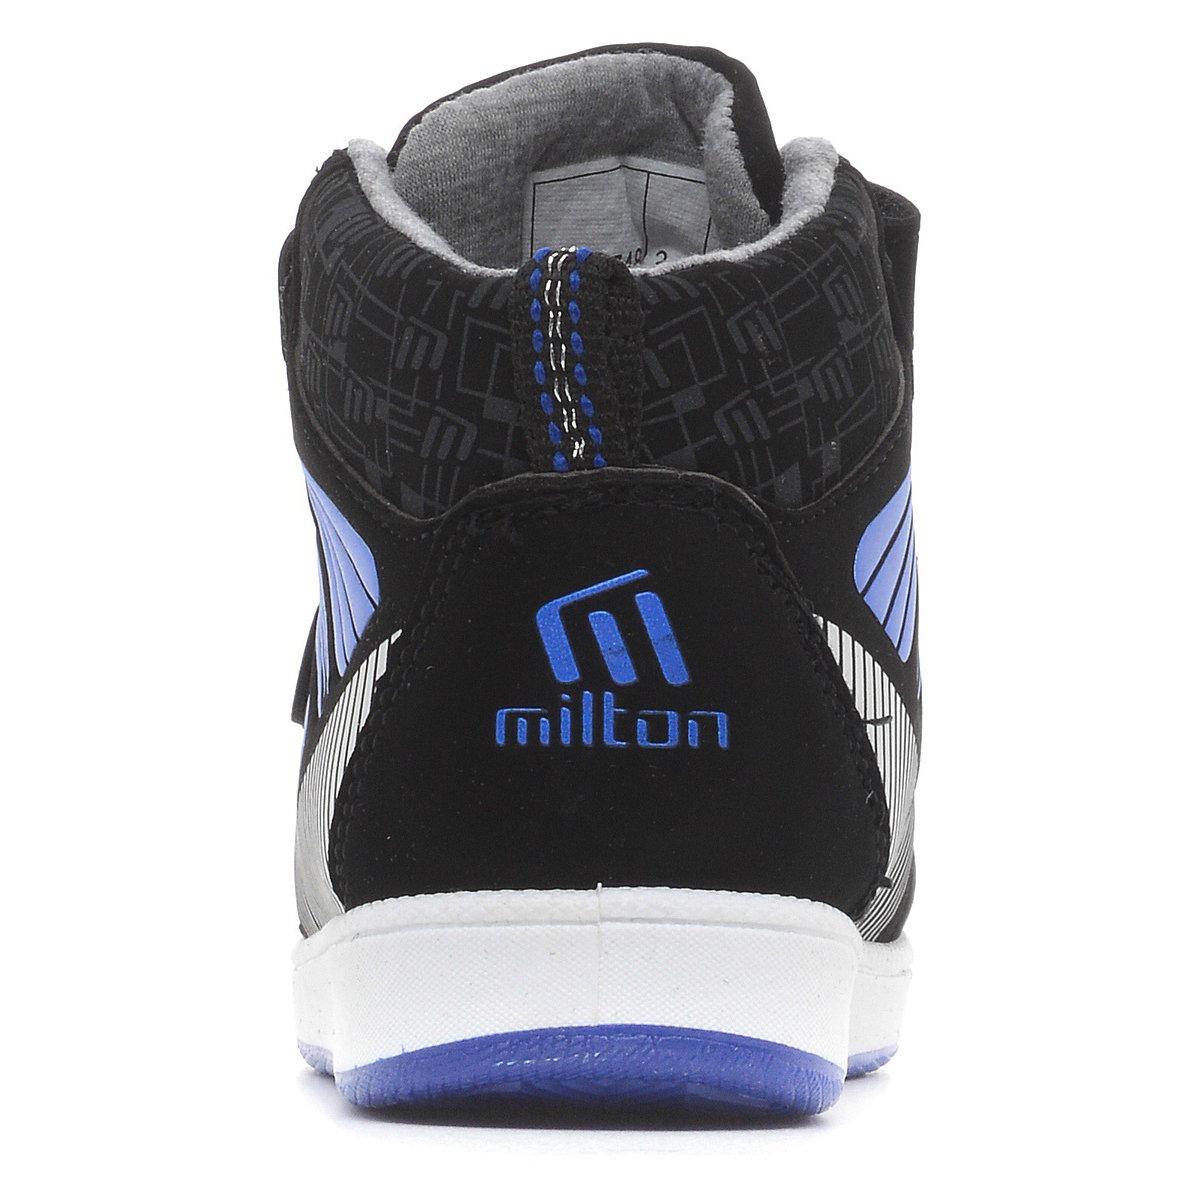 25748  Milton Ботинки оптом, размеры 31-36